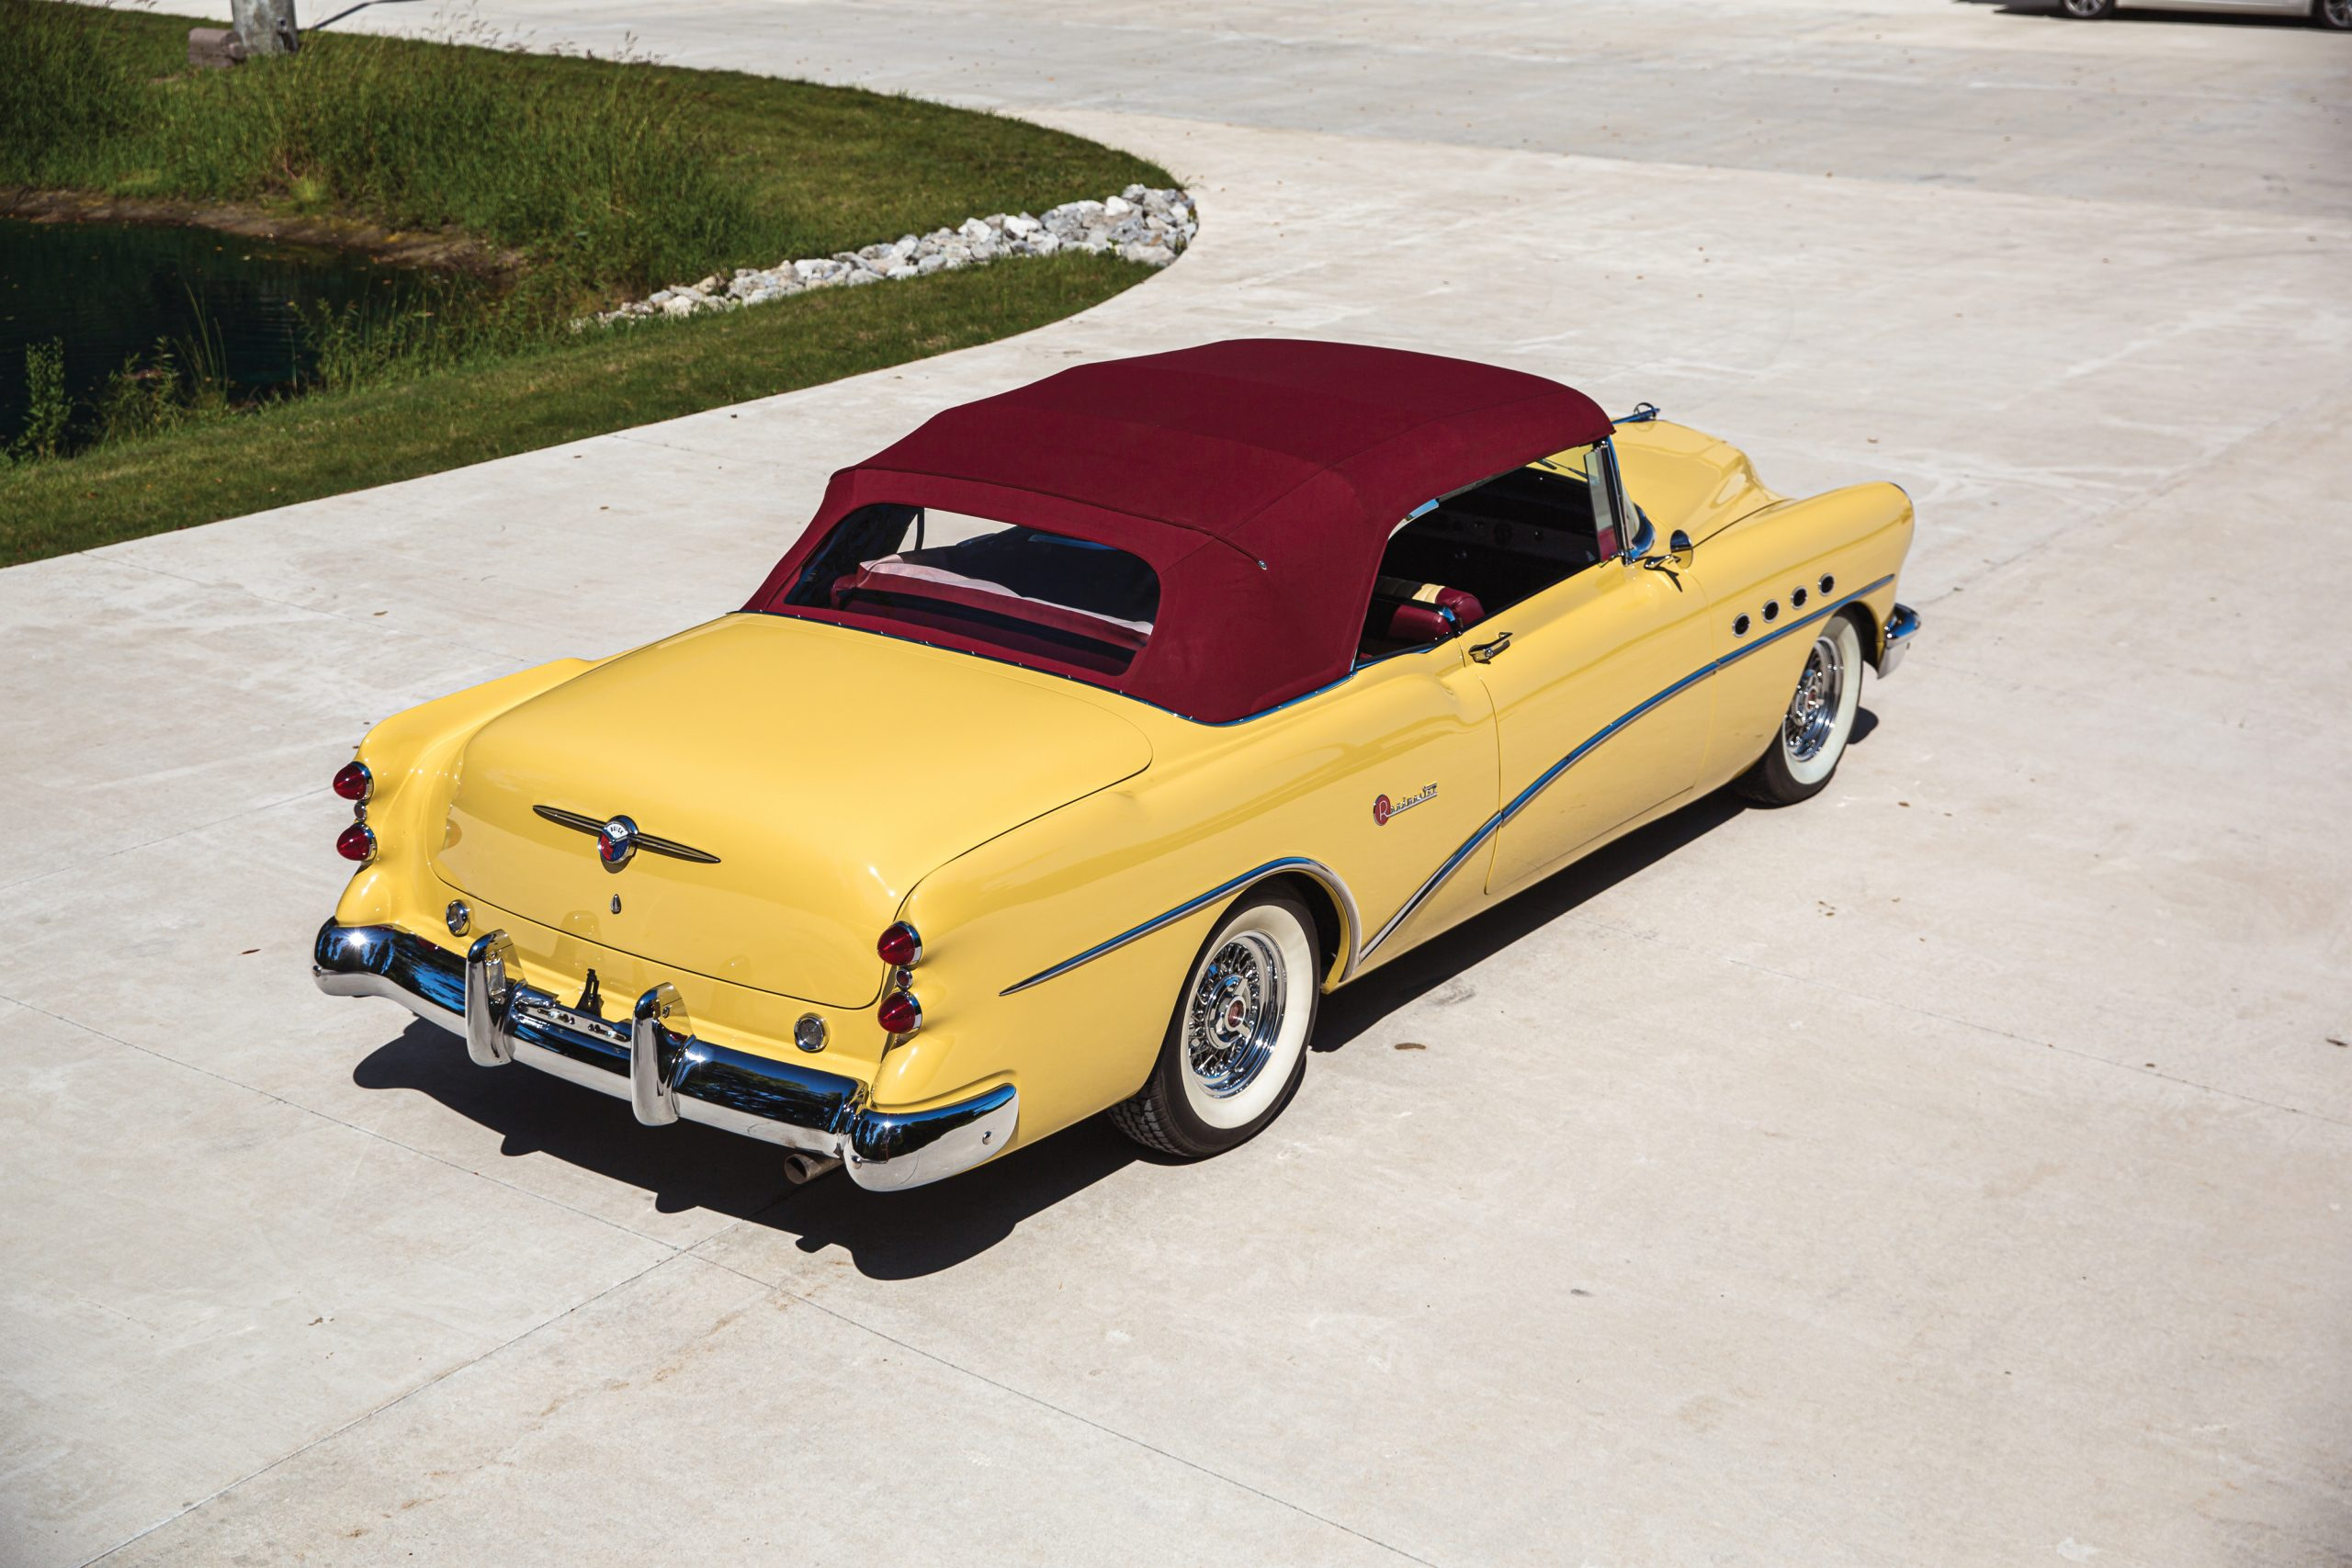 1954 Buick Roadmaster Convertible rear three-quarter